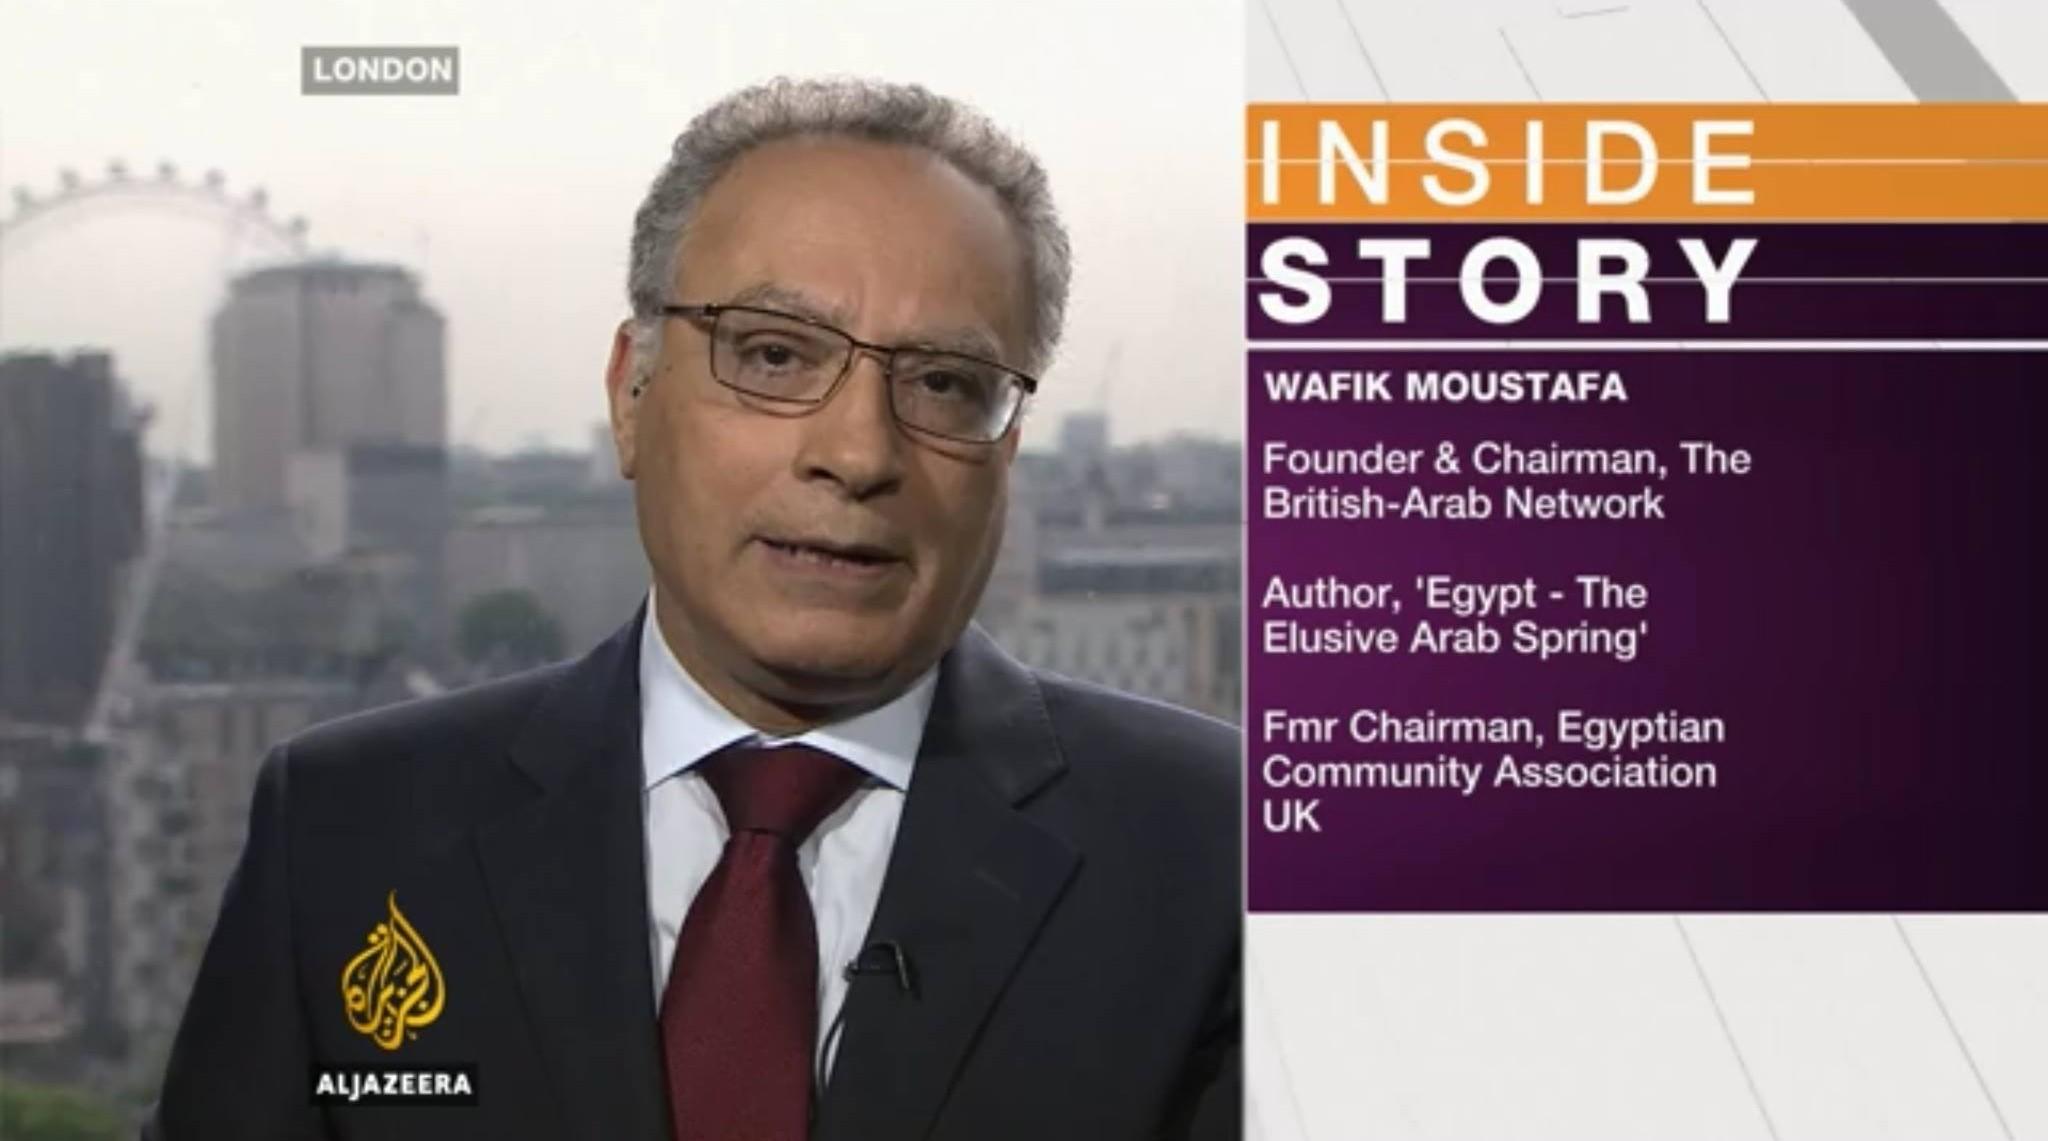 wafikl-al-jazeera-morsi-inside-story-e1434815993427